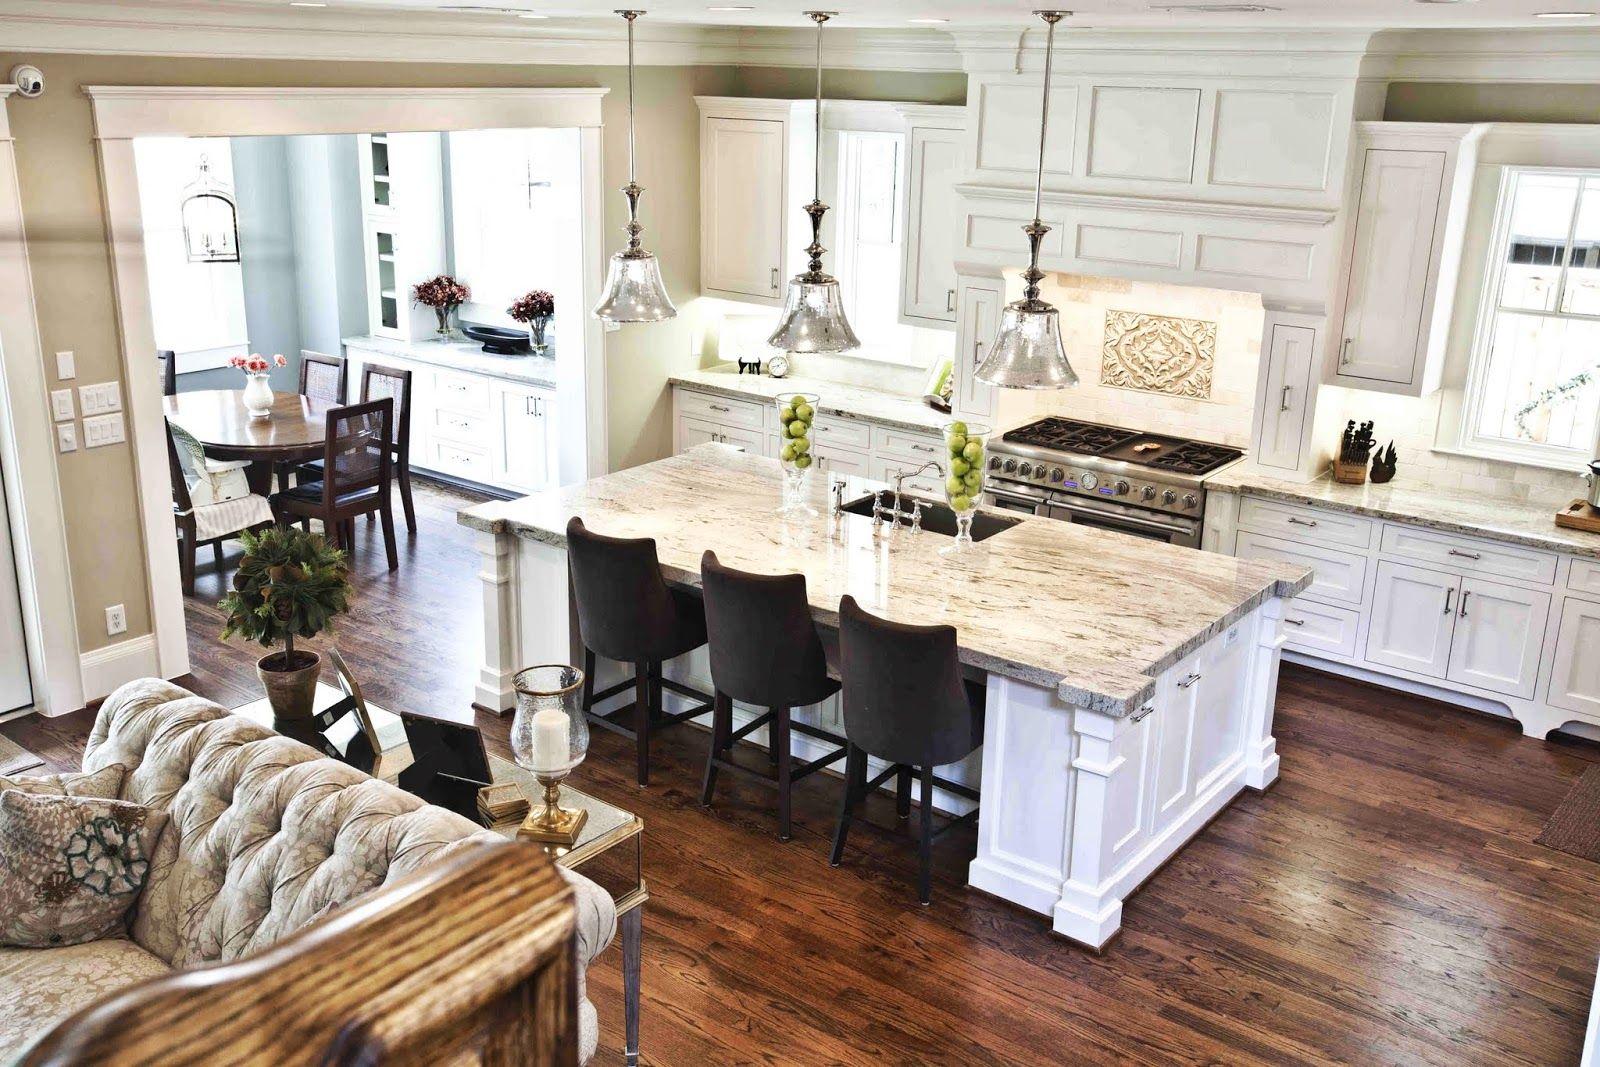 New Craftsman Home Photo Shoot Cedar Hill Farmhouse Kitchen Living Home Kitchens Kitchen Layout